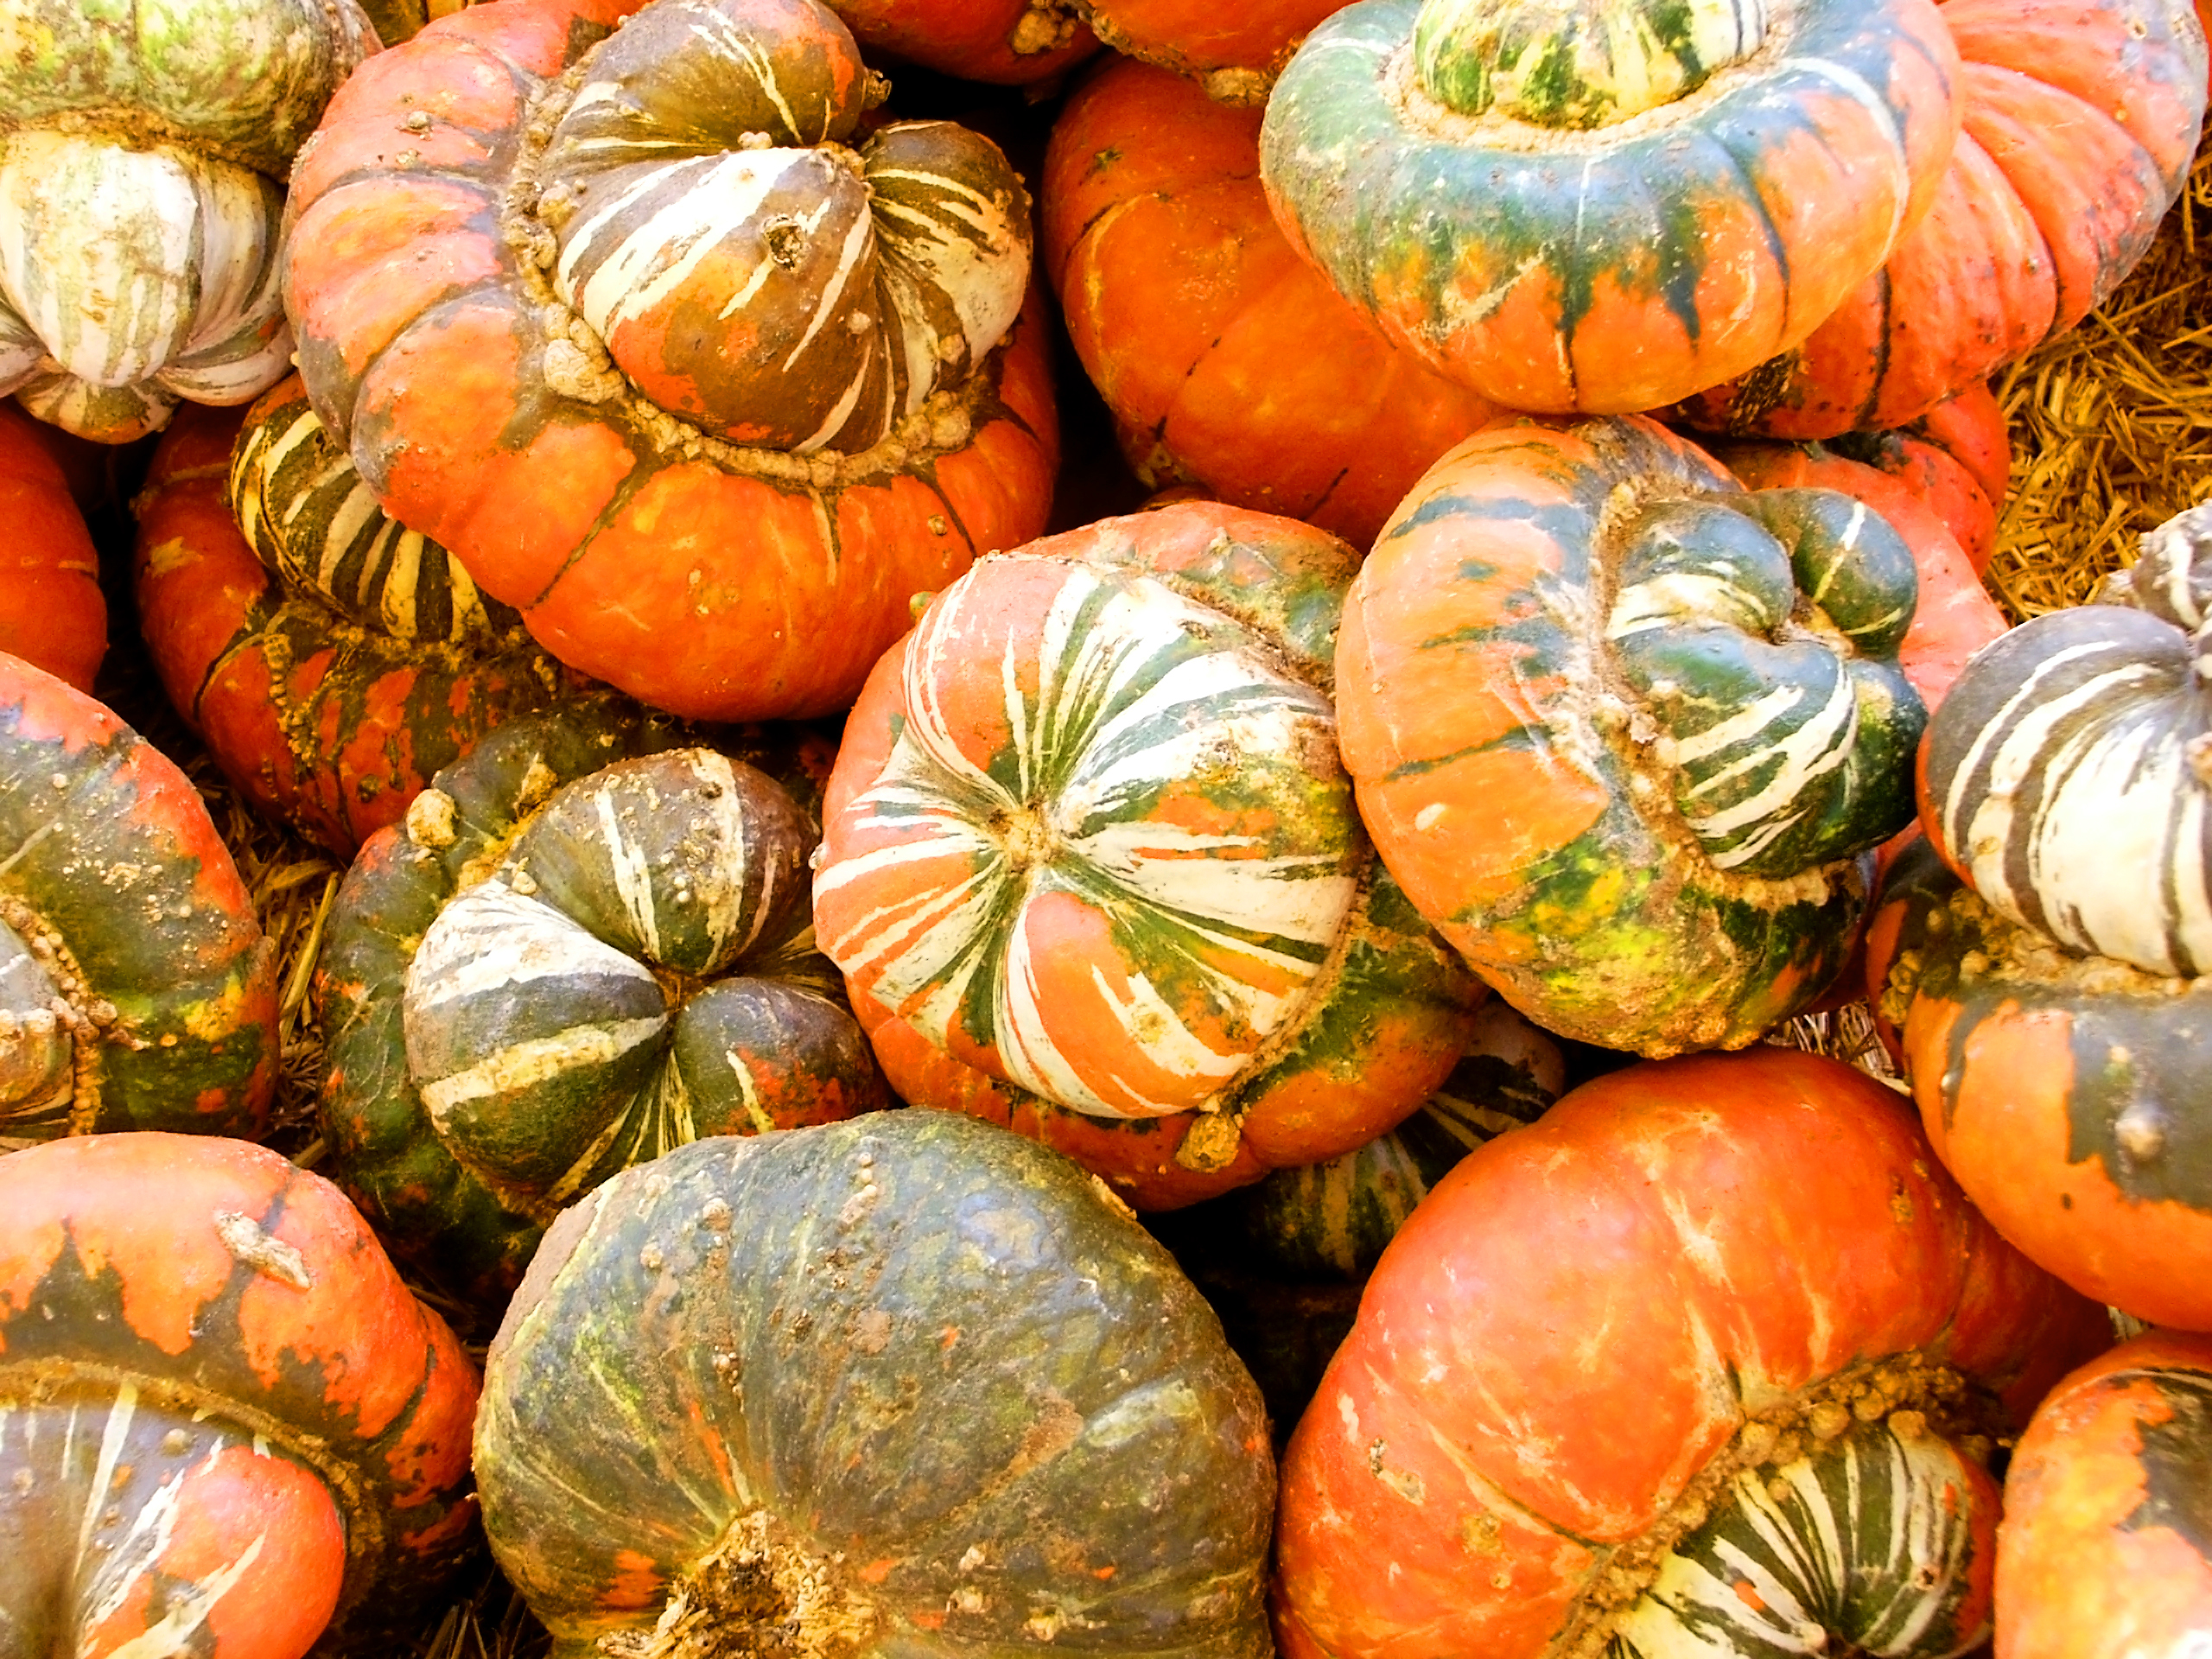 Pumpkins, Plant, Market, Mini, Miniature, HQ Photo